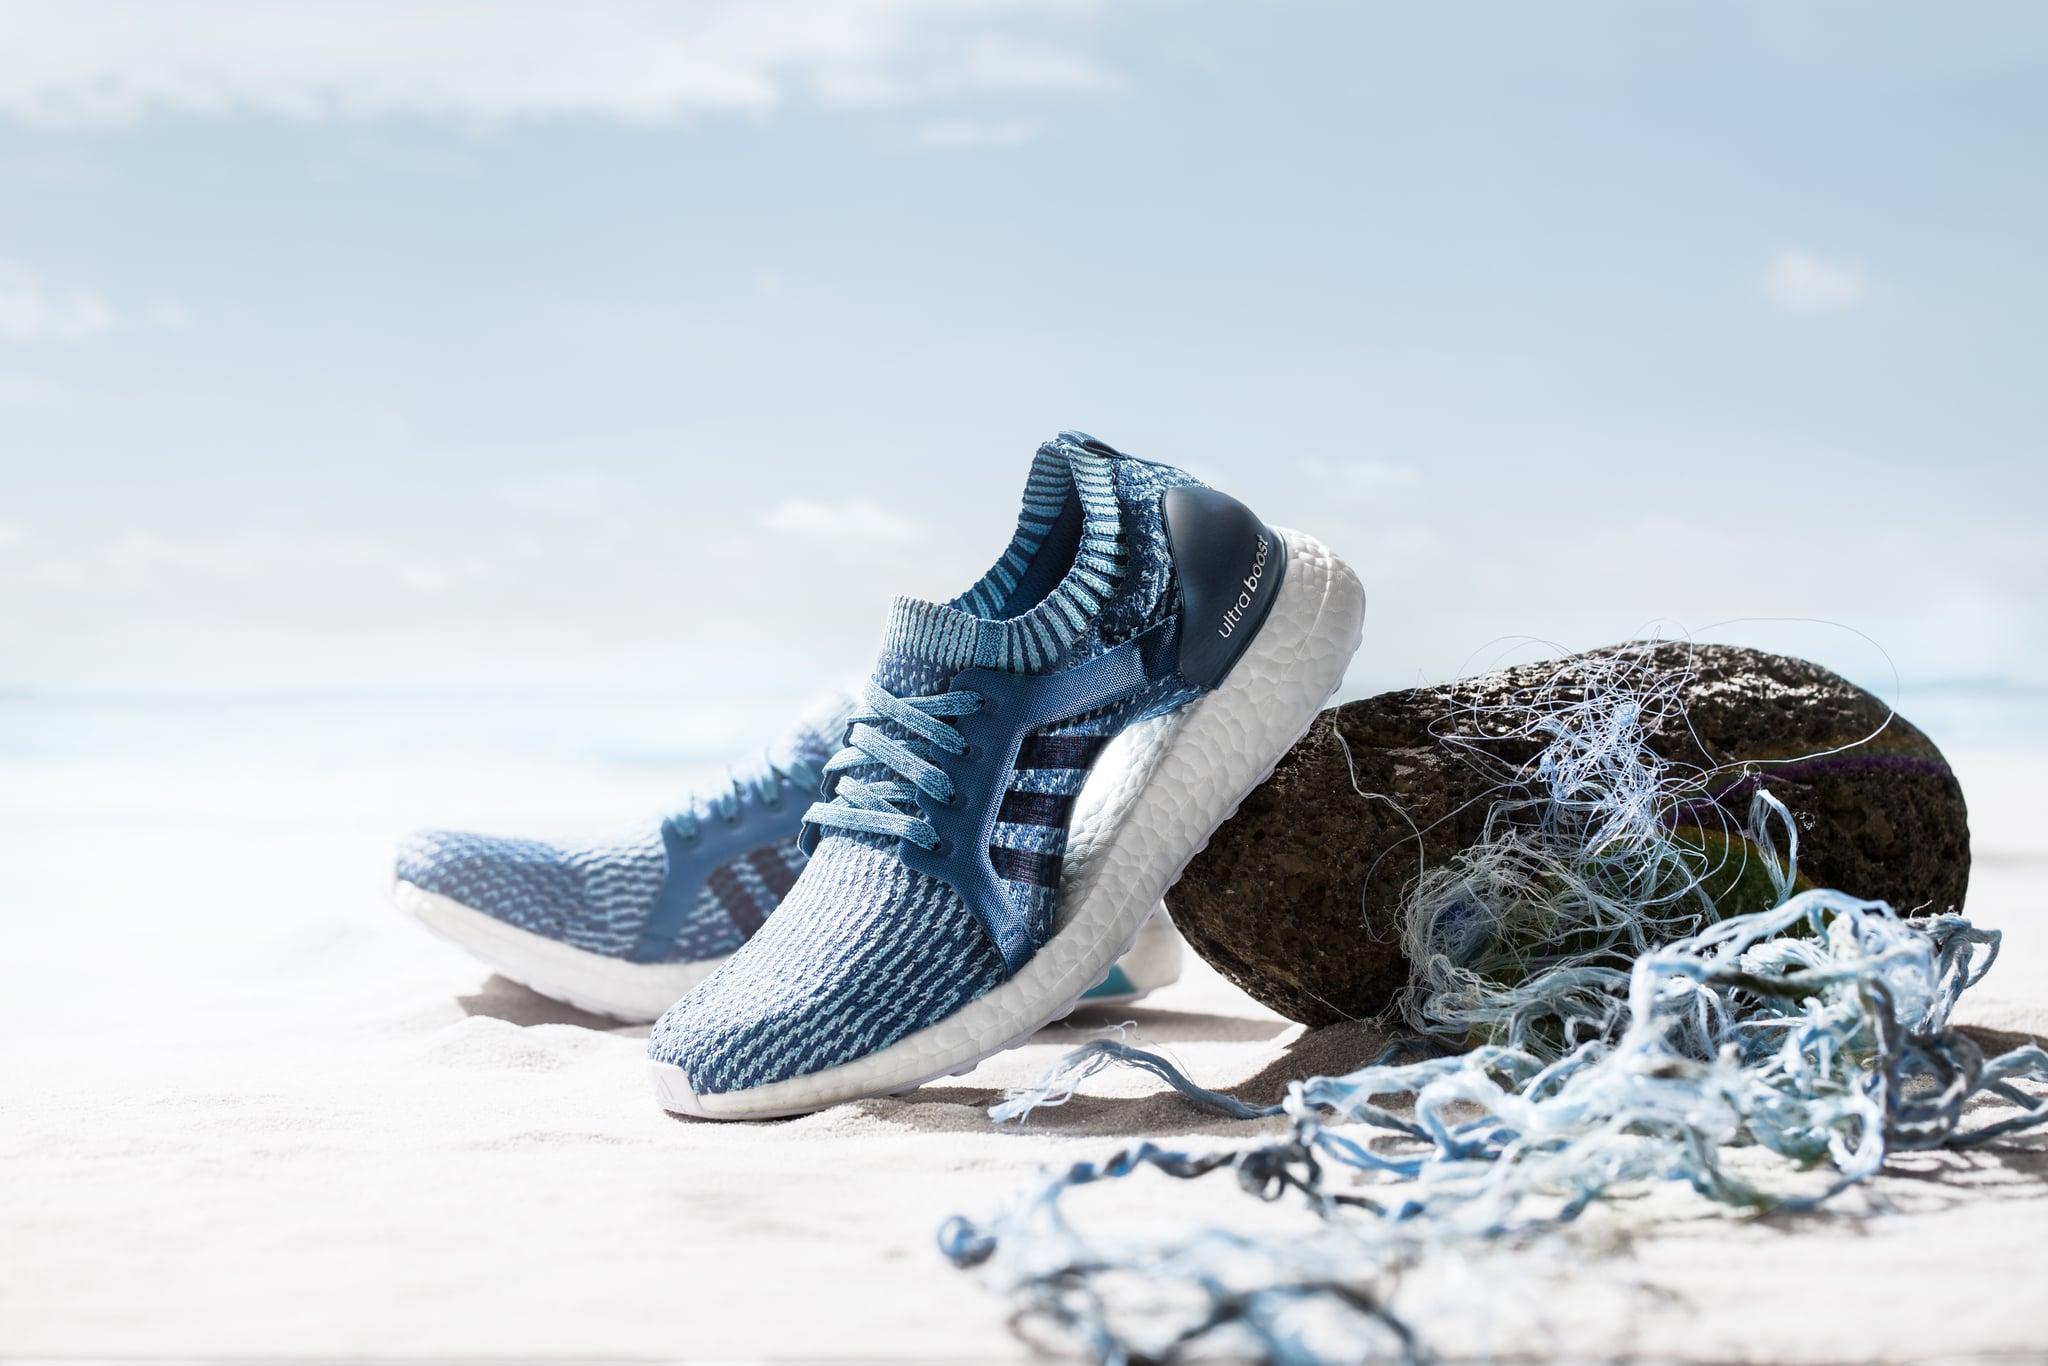 Adidas UltraBoost X Parley Women's Sneakers | POPSUGAR Fitness